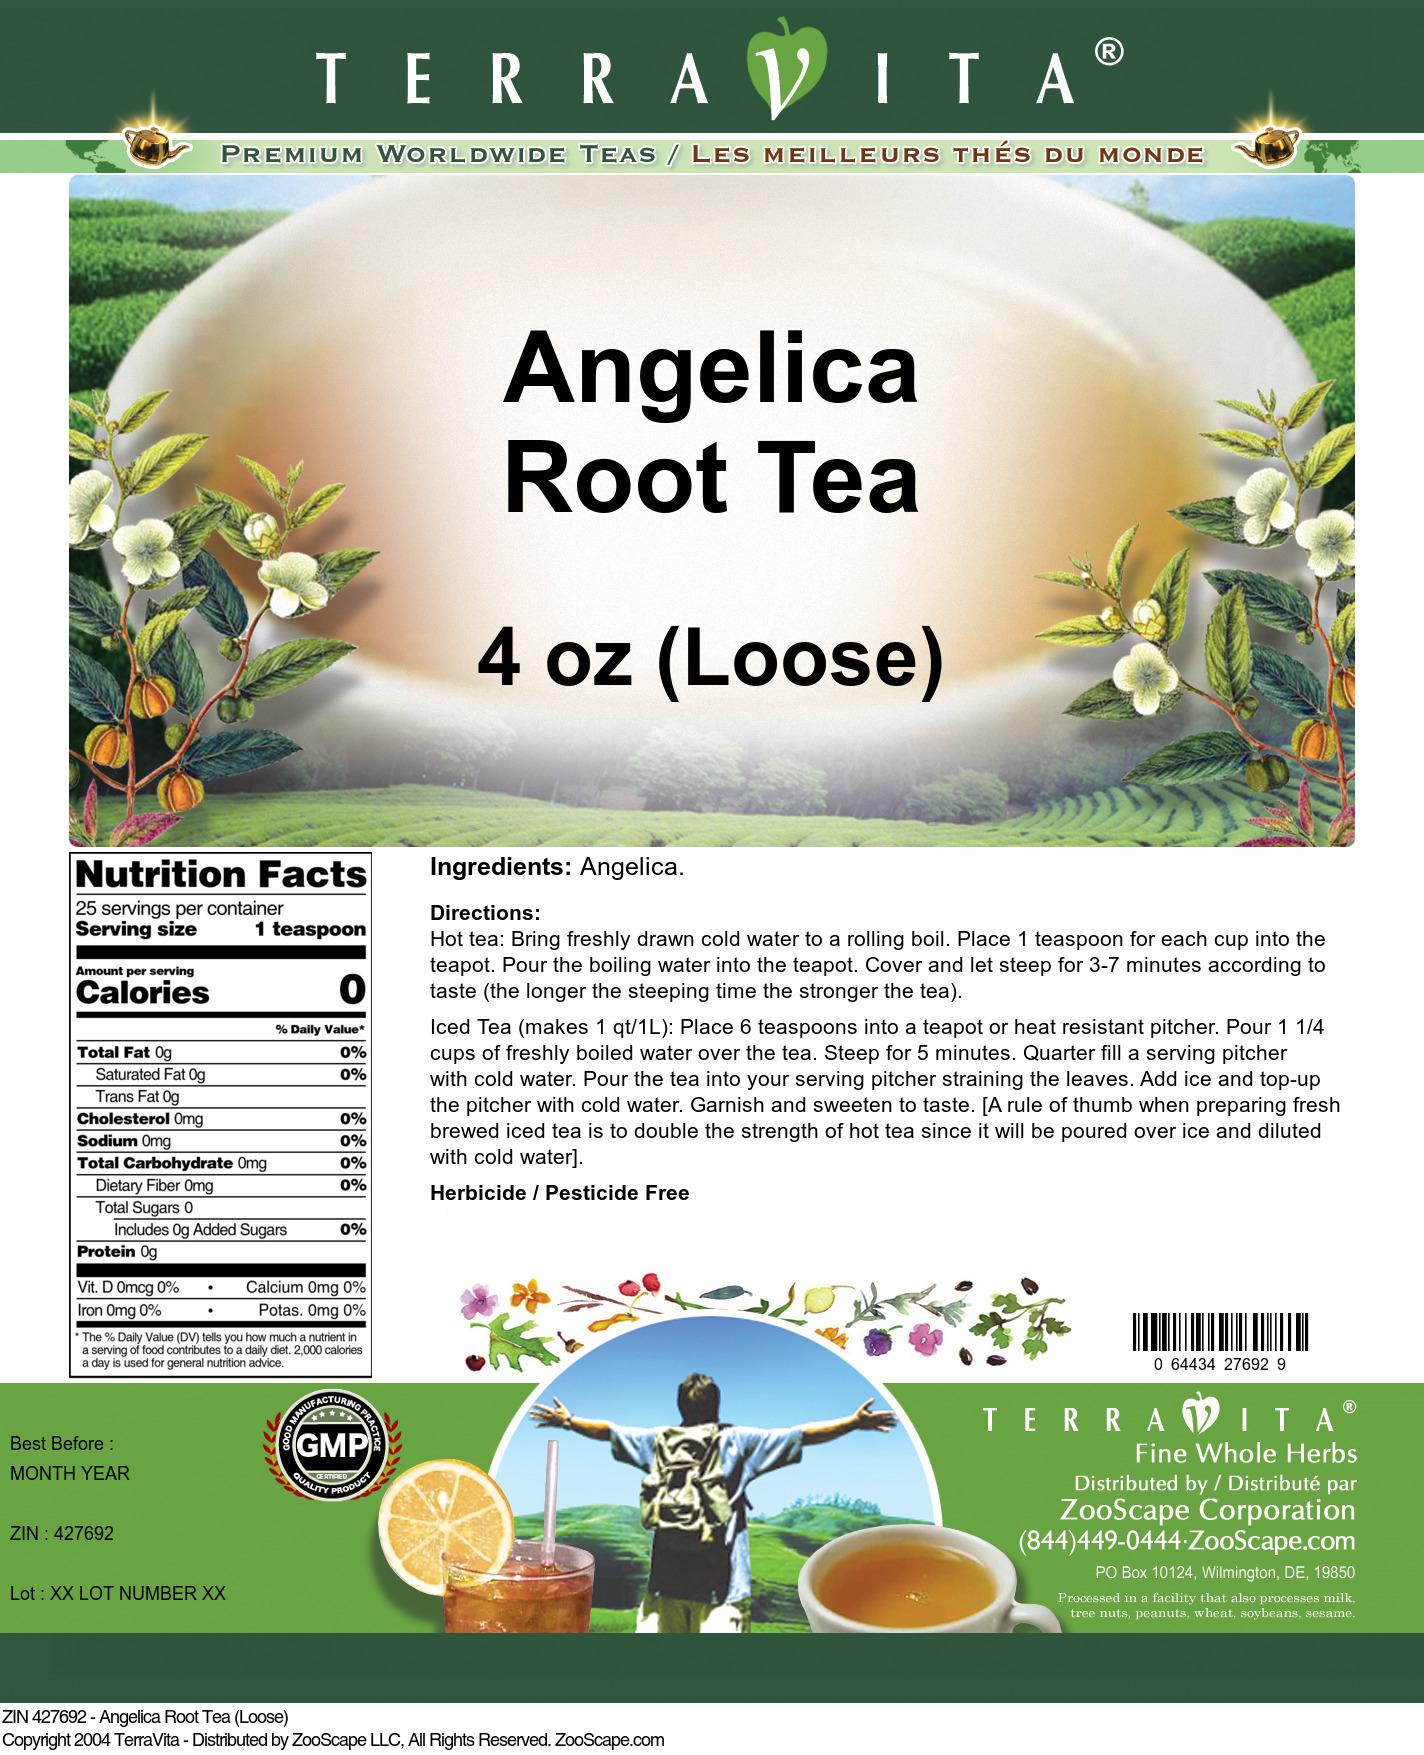 Angelica Root Tea (Loose)